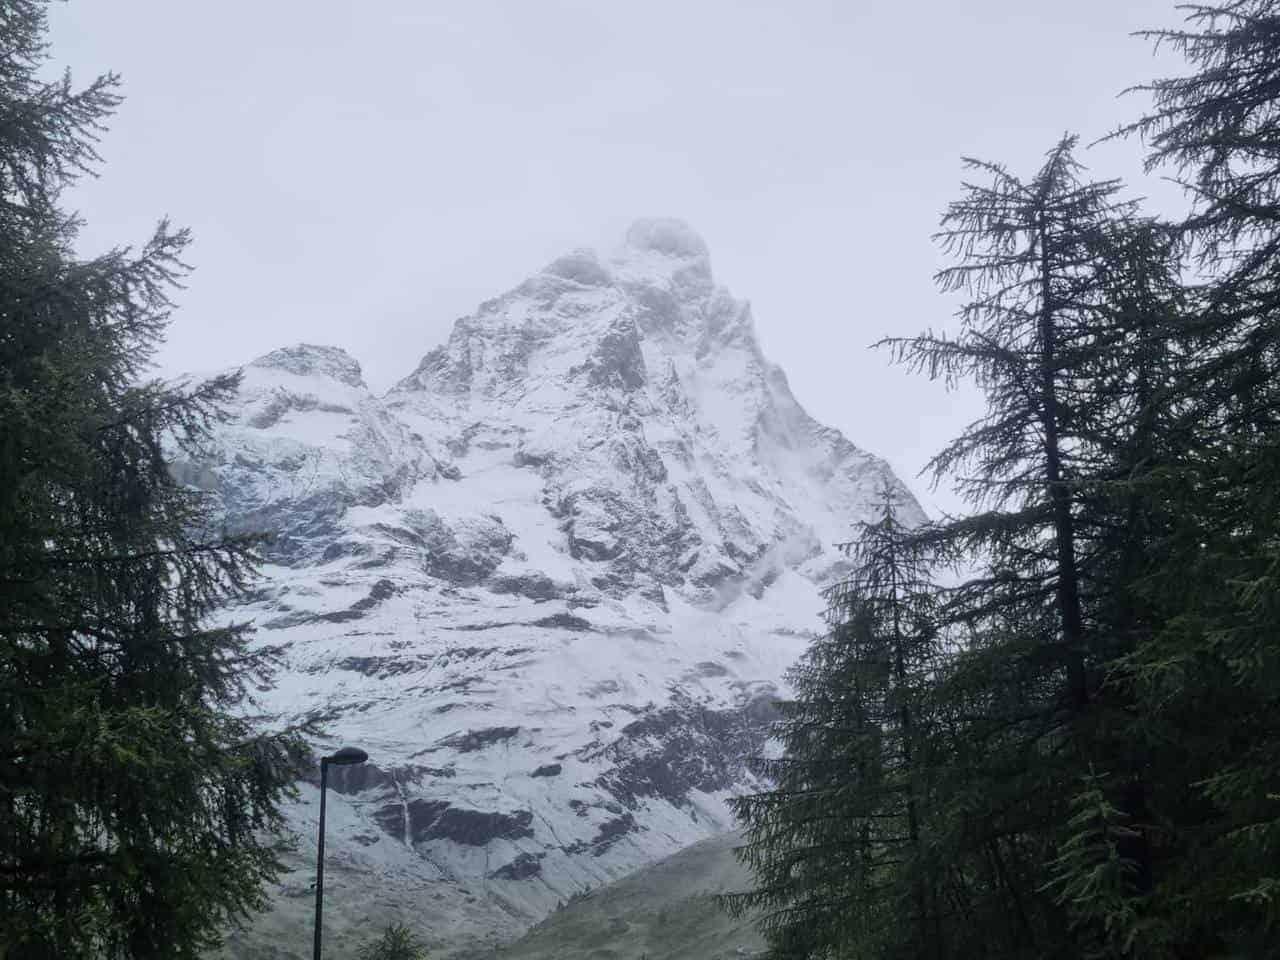 218165223 1000165967453409 5046573683127860762 n - Meteo Valle d'Aosta, la neve imbianca Cervinia in pieno luglio